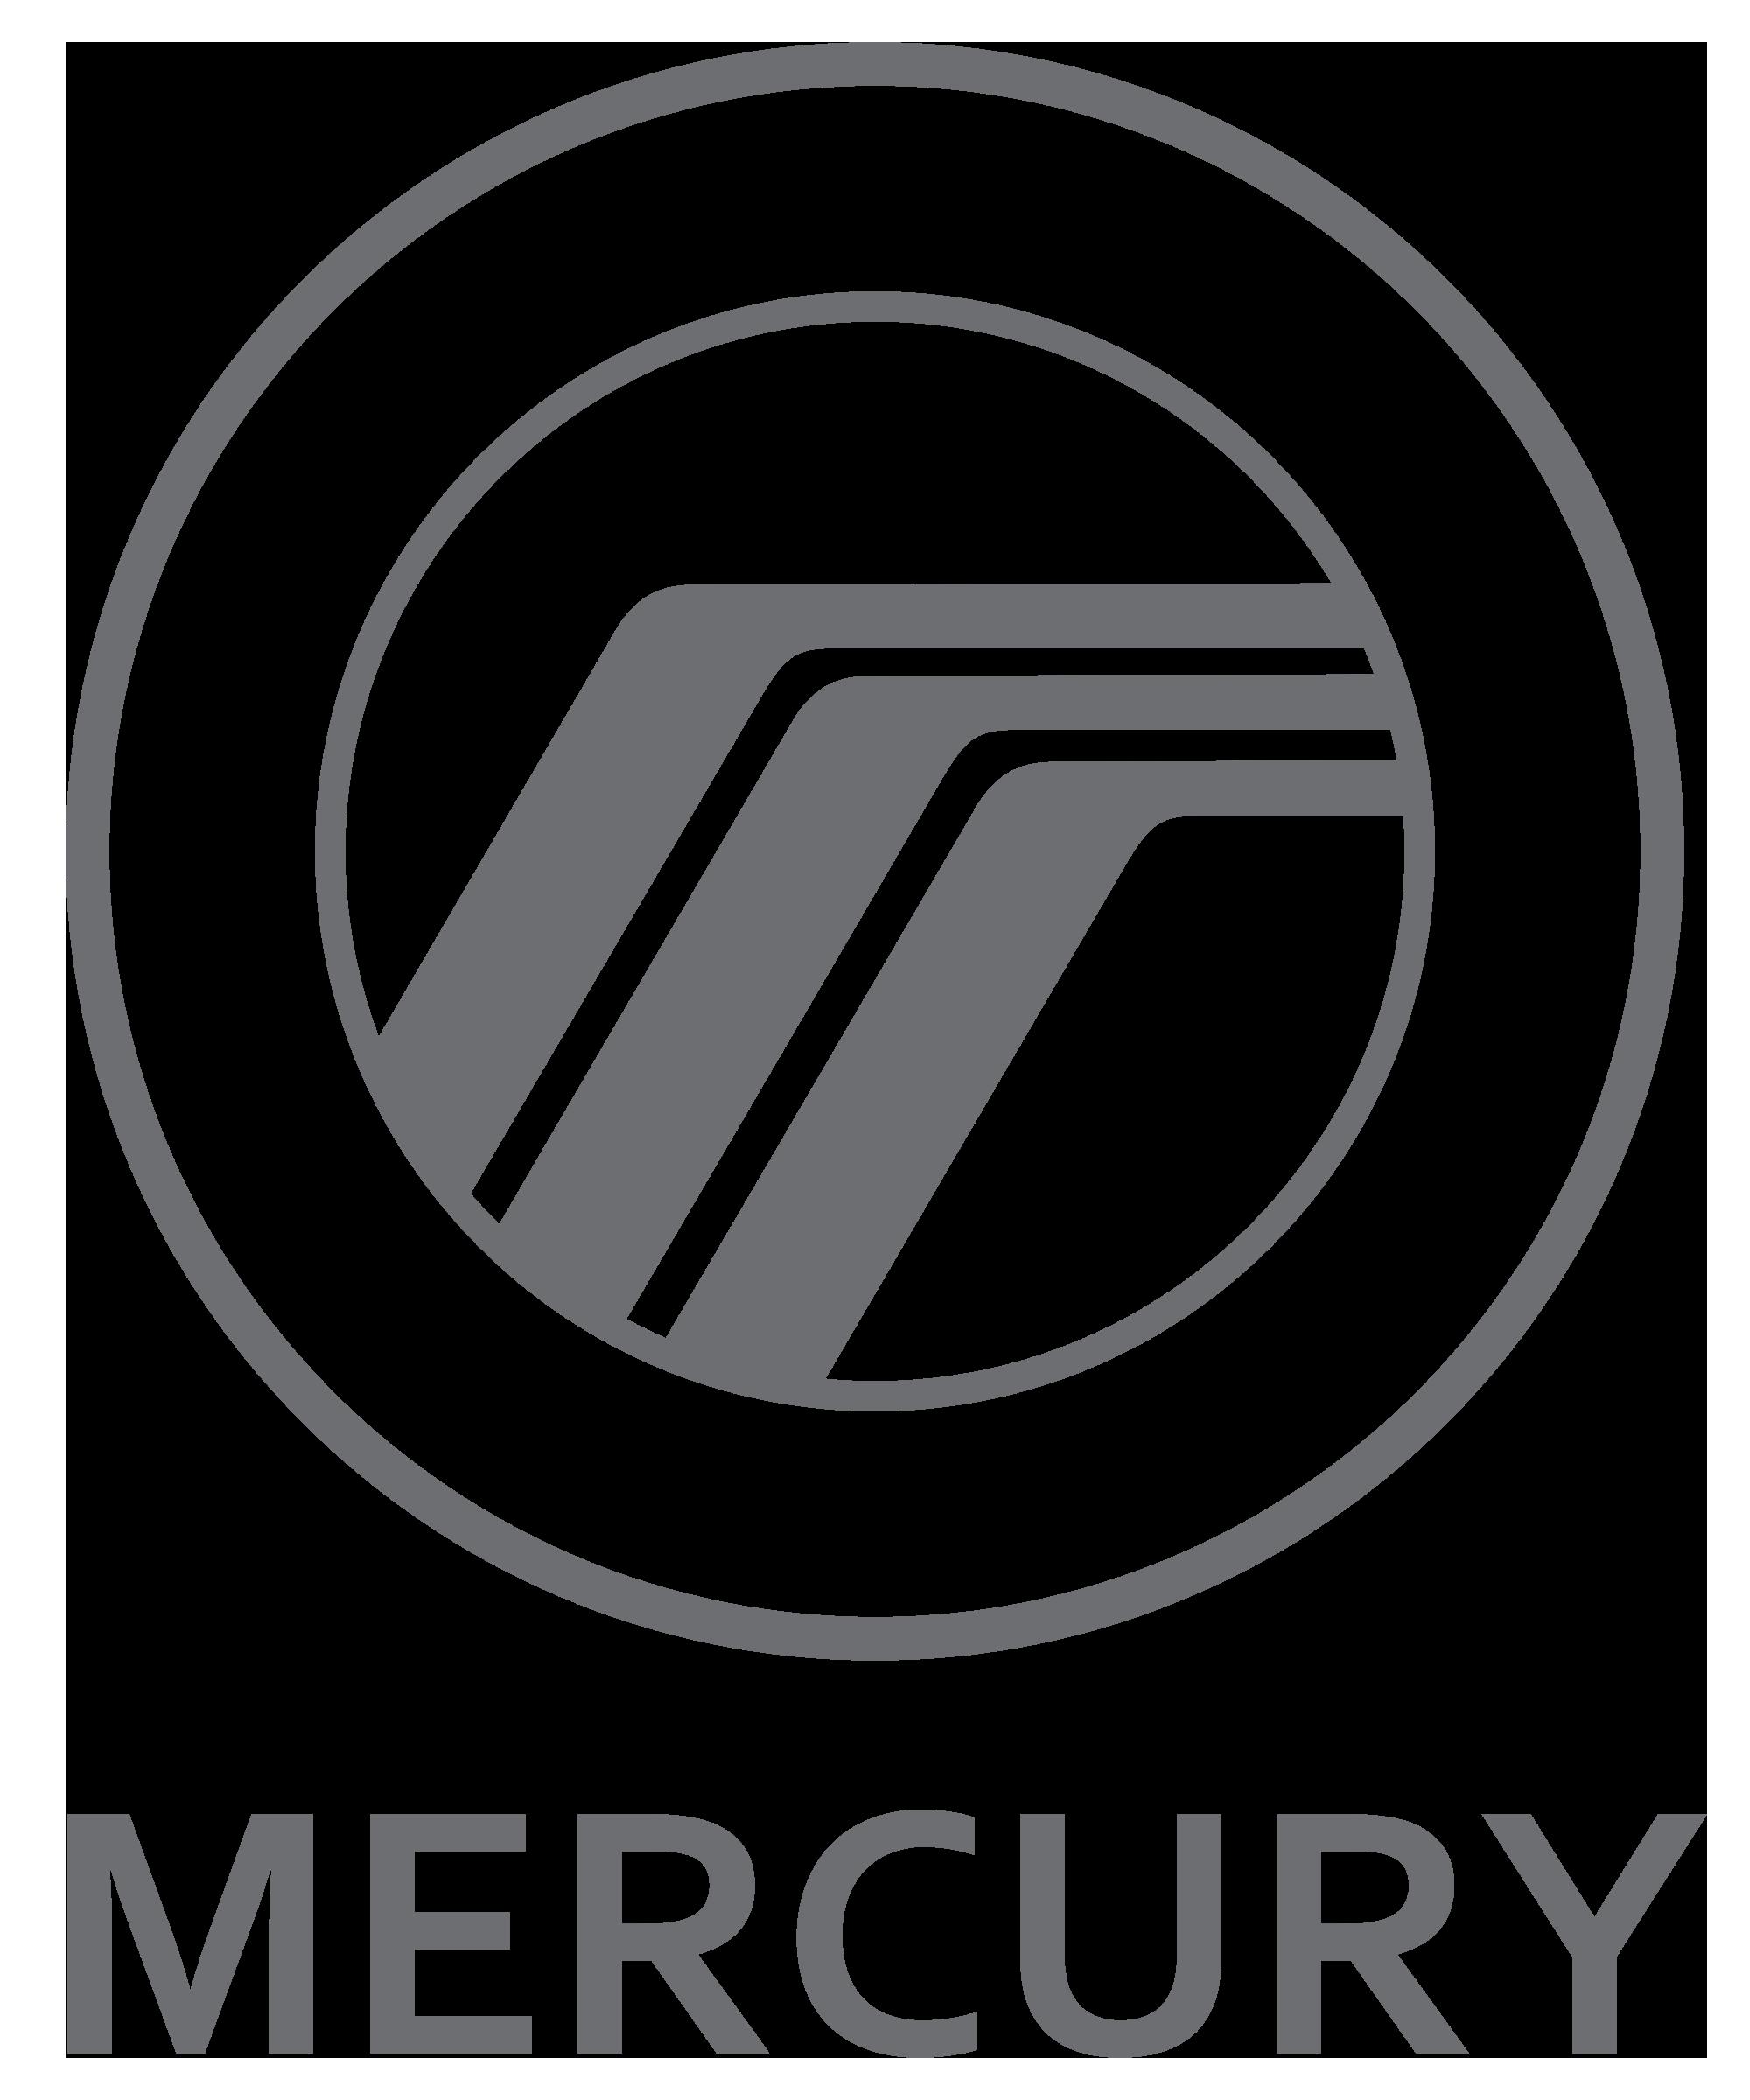 11.mercury.png